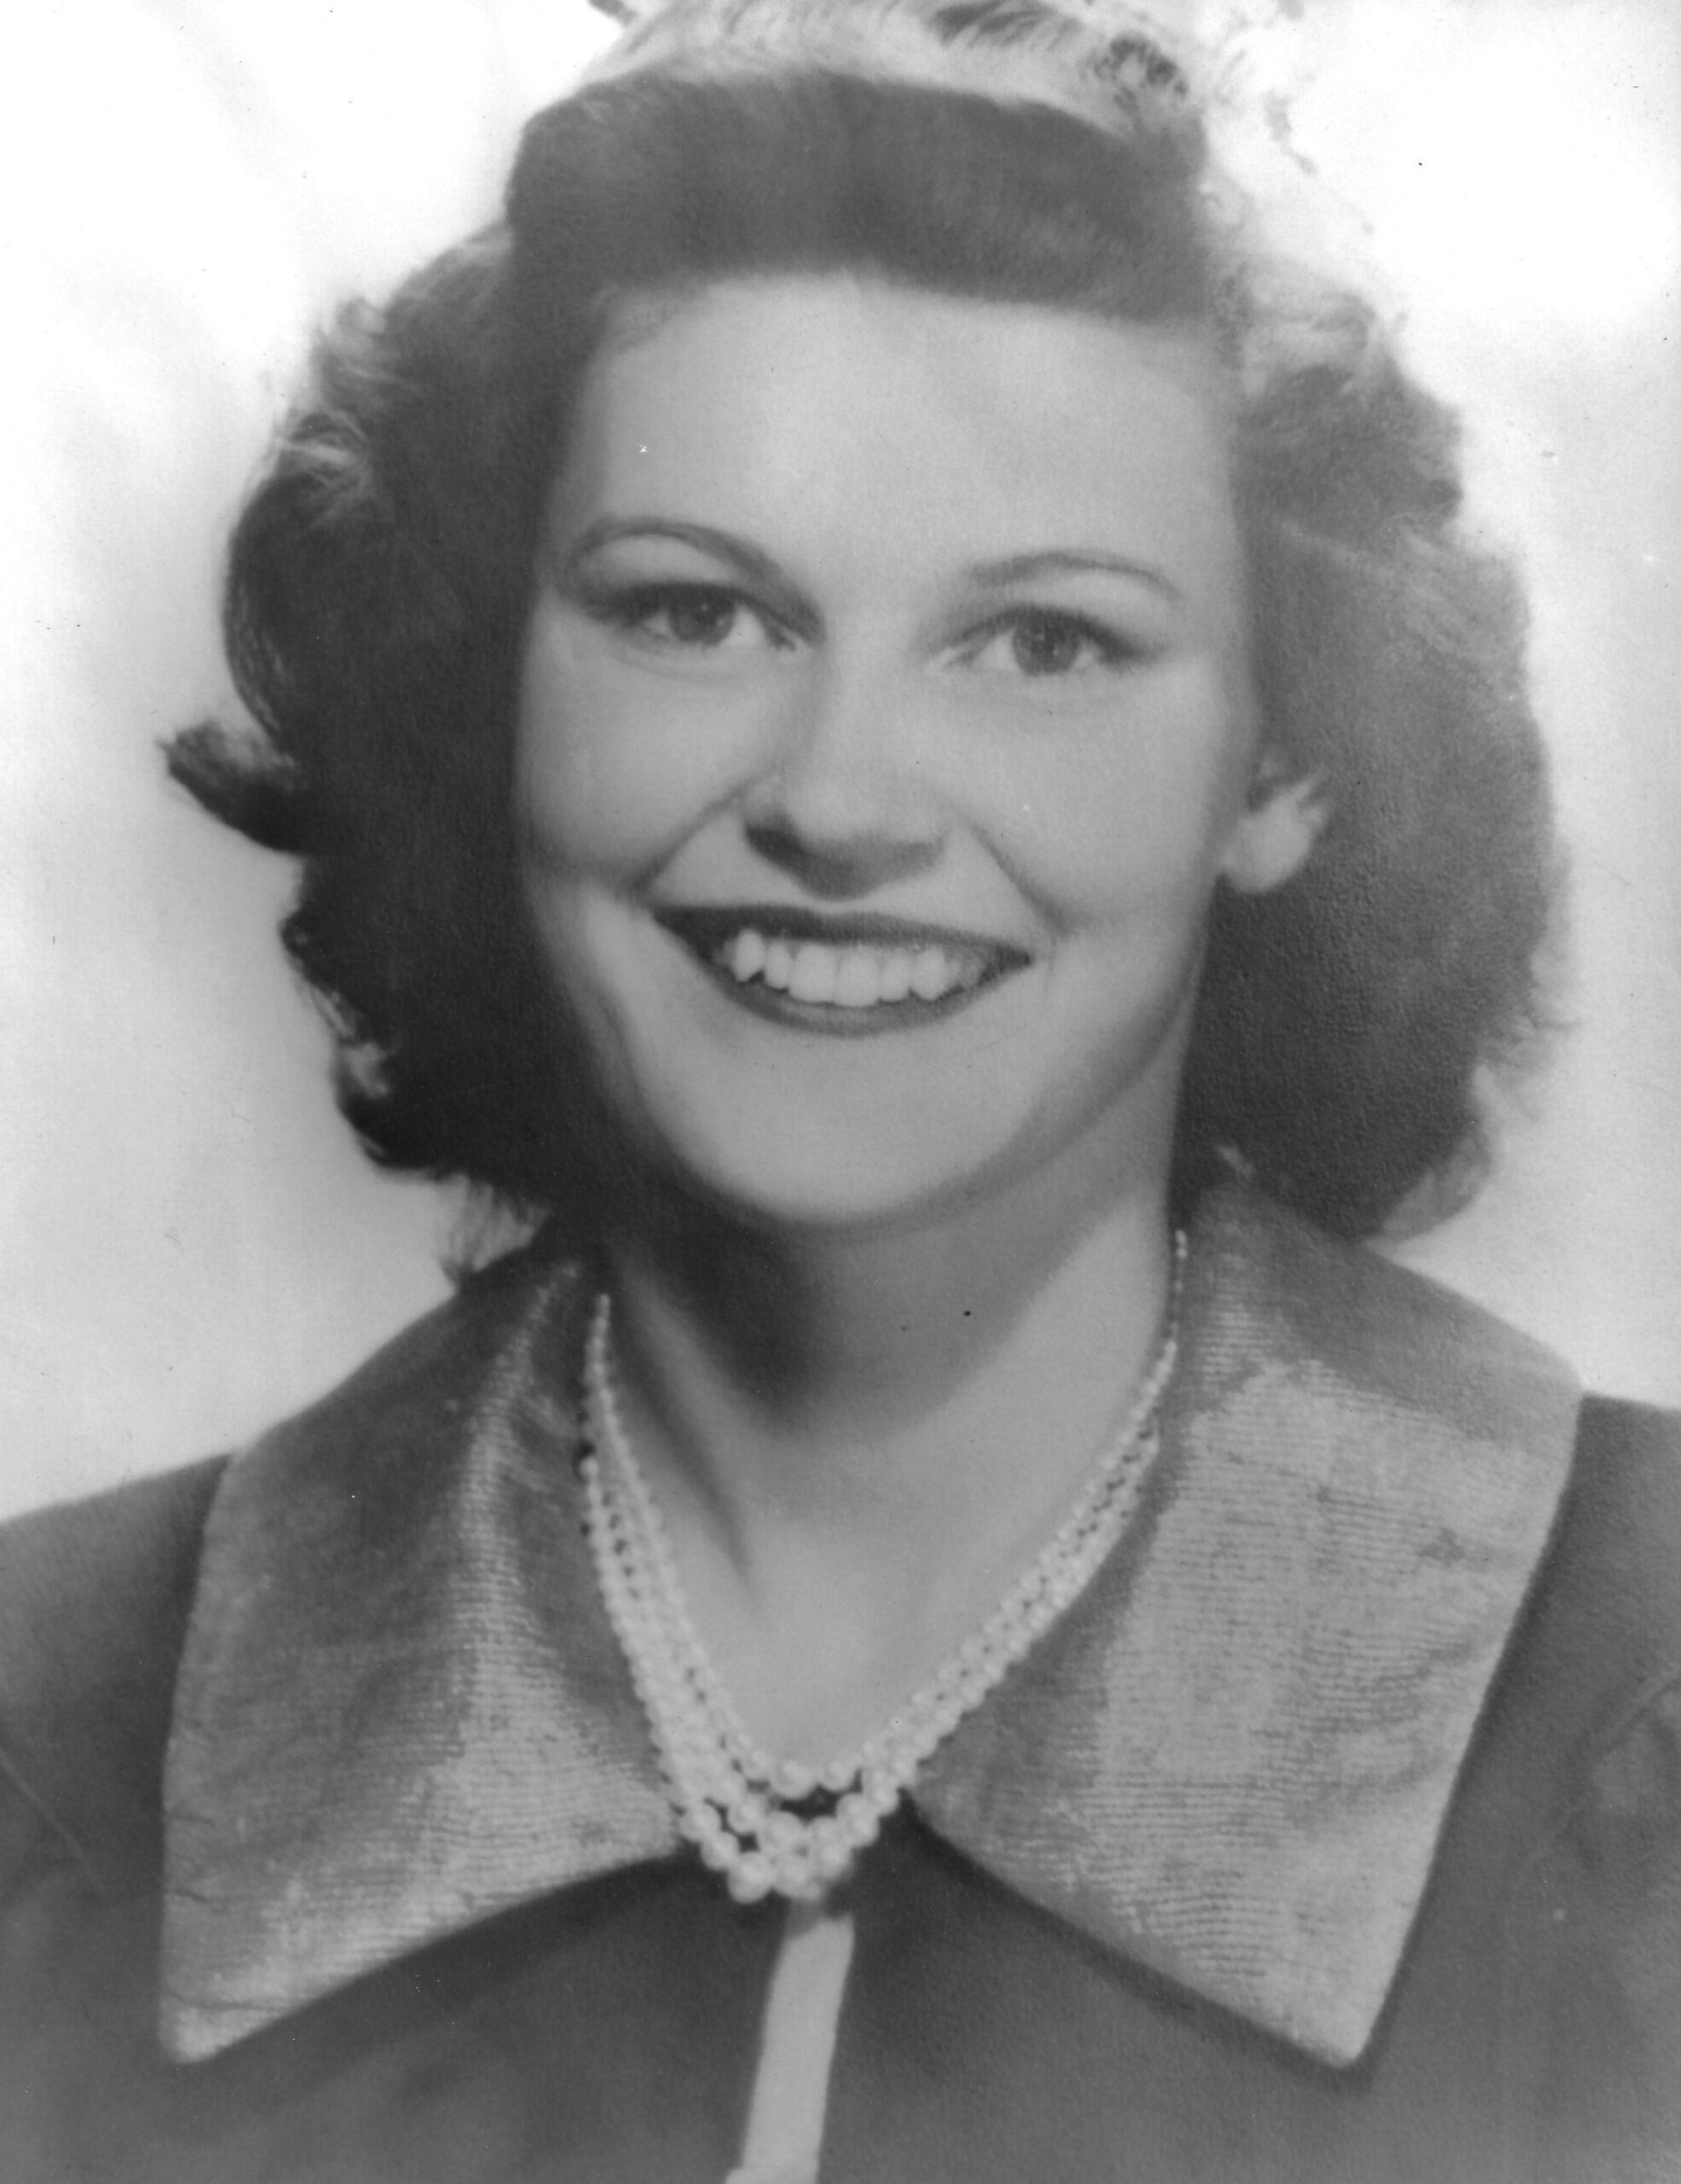 1948 Lincoln County Fair Queen